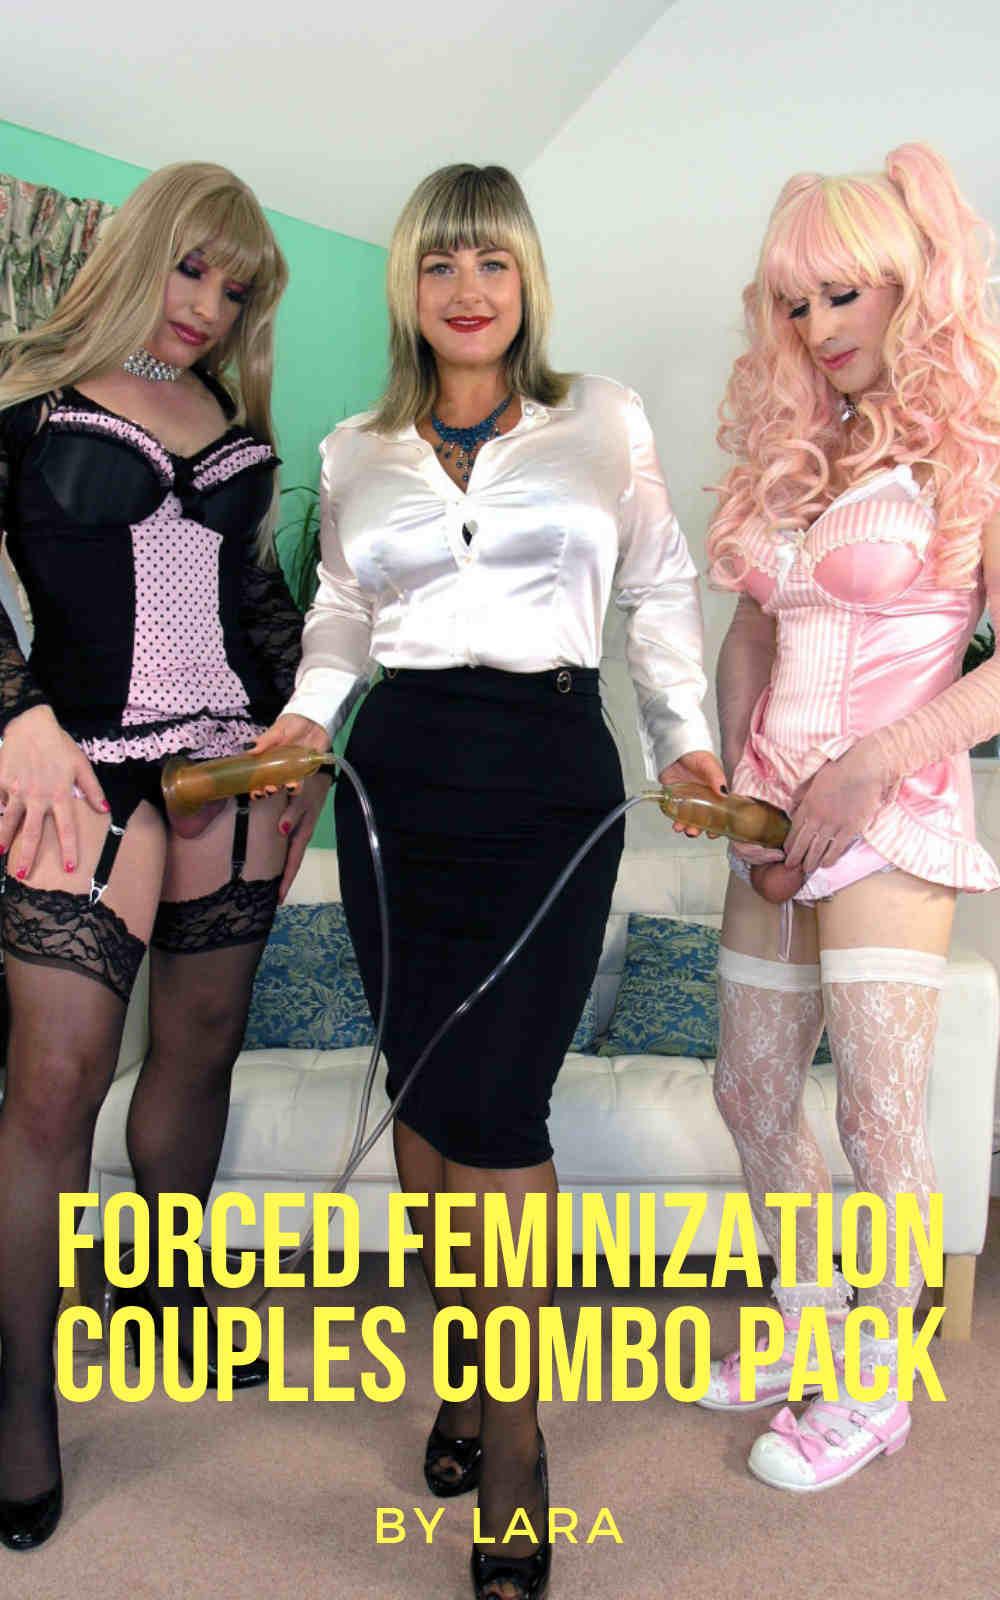 Forced sissification cdn.dewtour.com: over